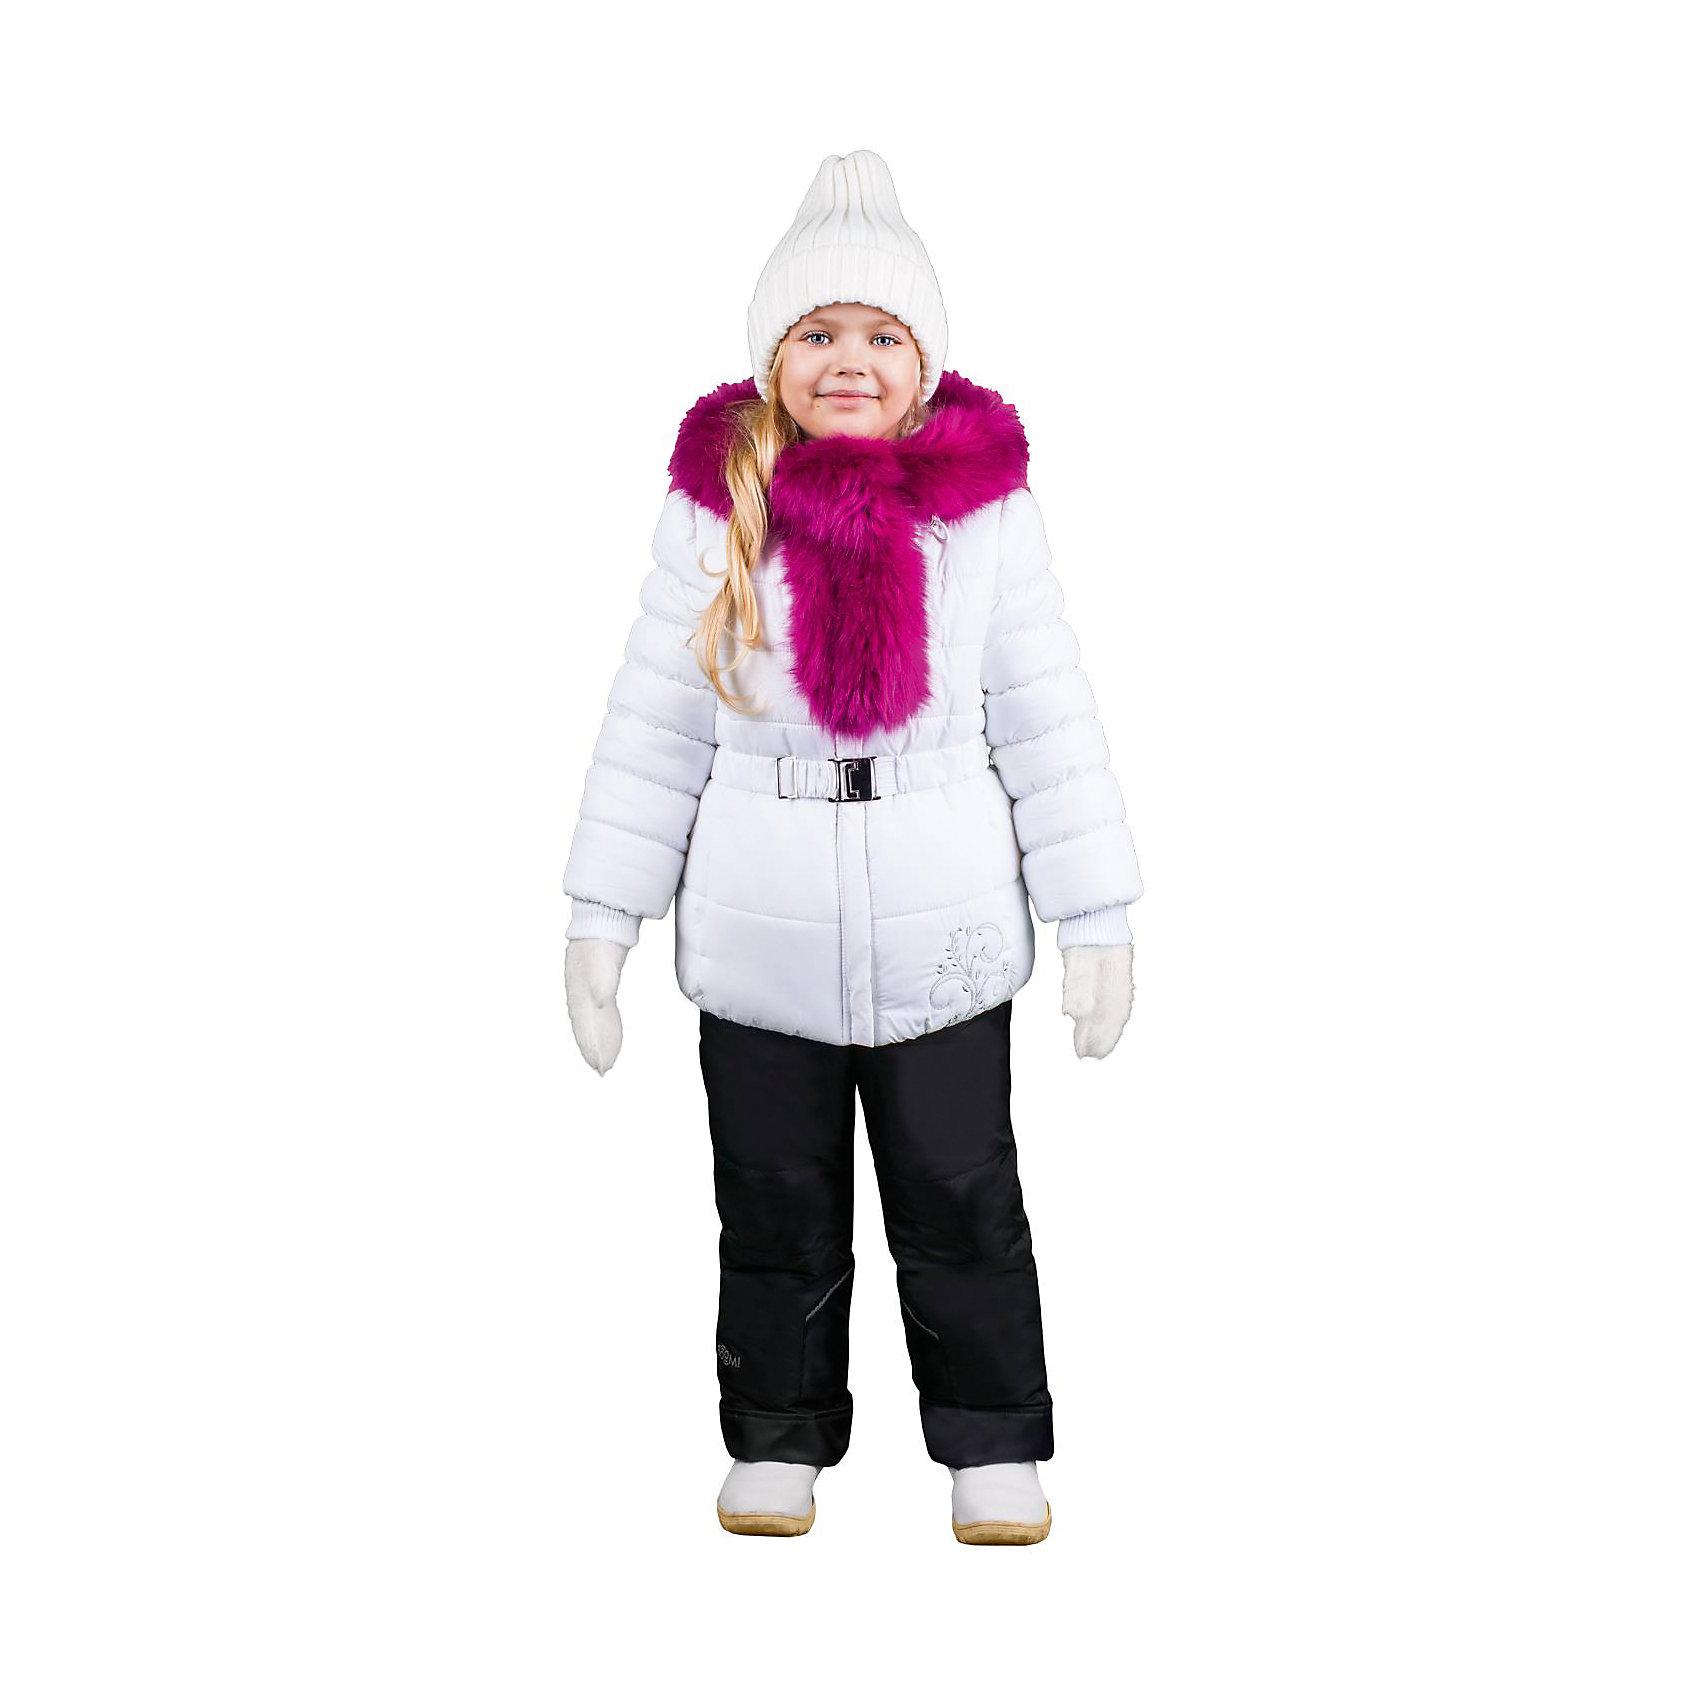 BOOM by Orby Комплект: куртка и брюки для девочки BOOM by Orby boom by orby комплект курта и брюки для девочки boom by orby